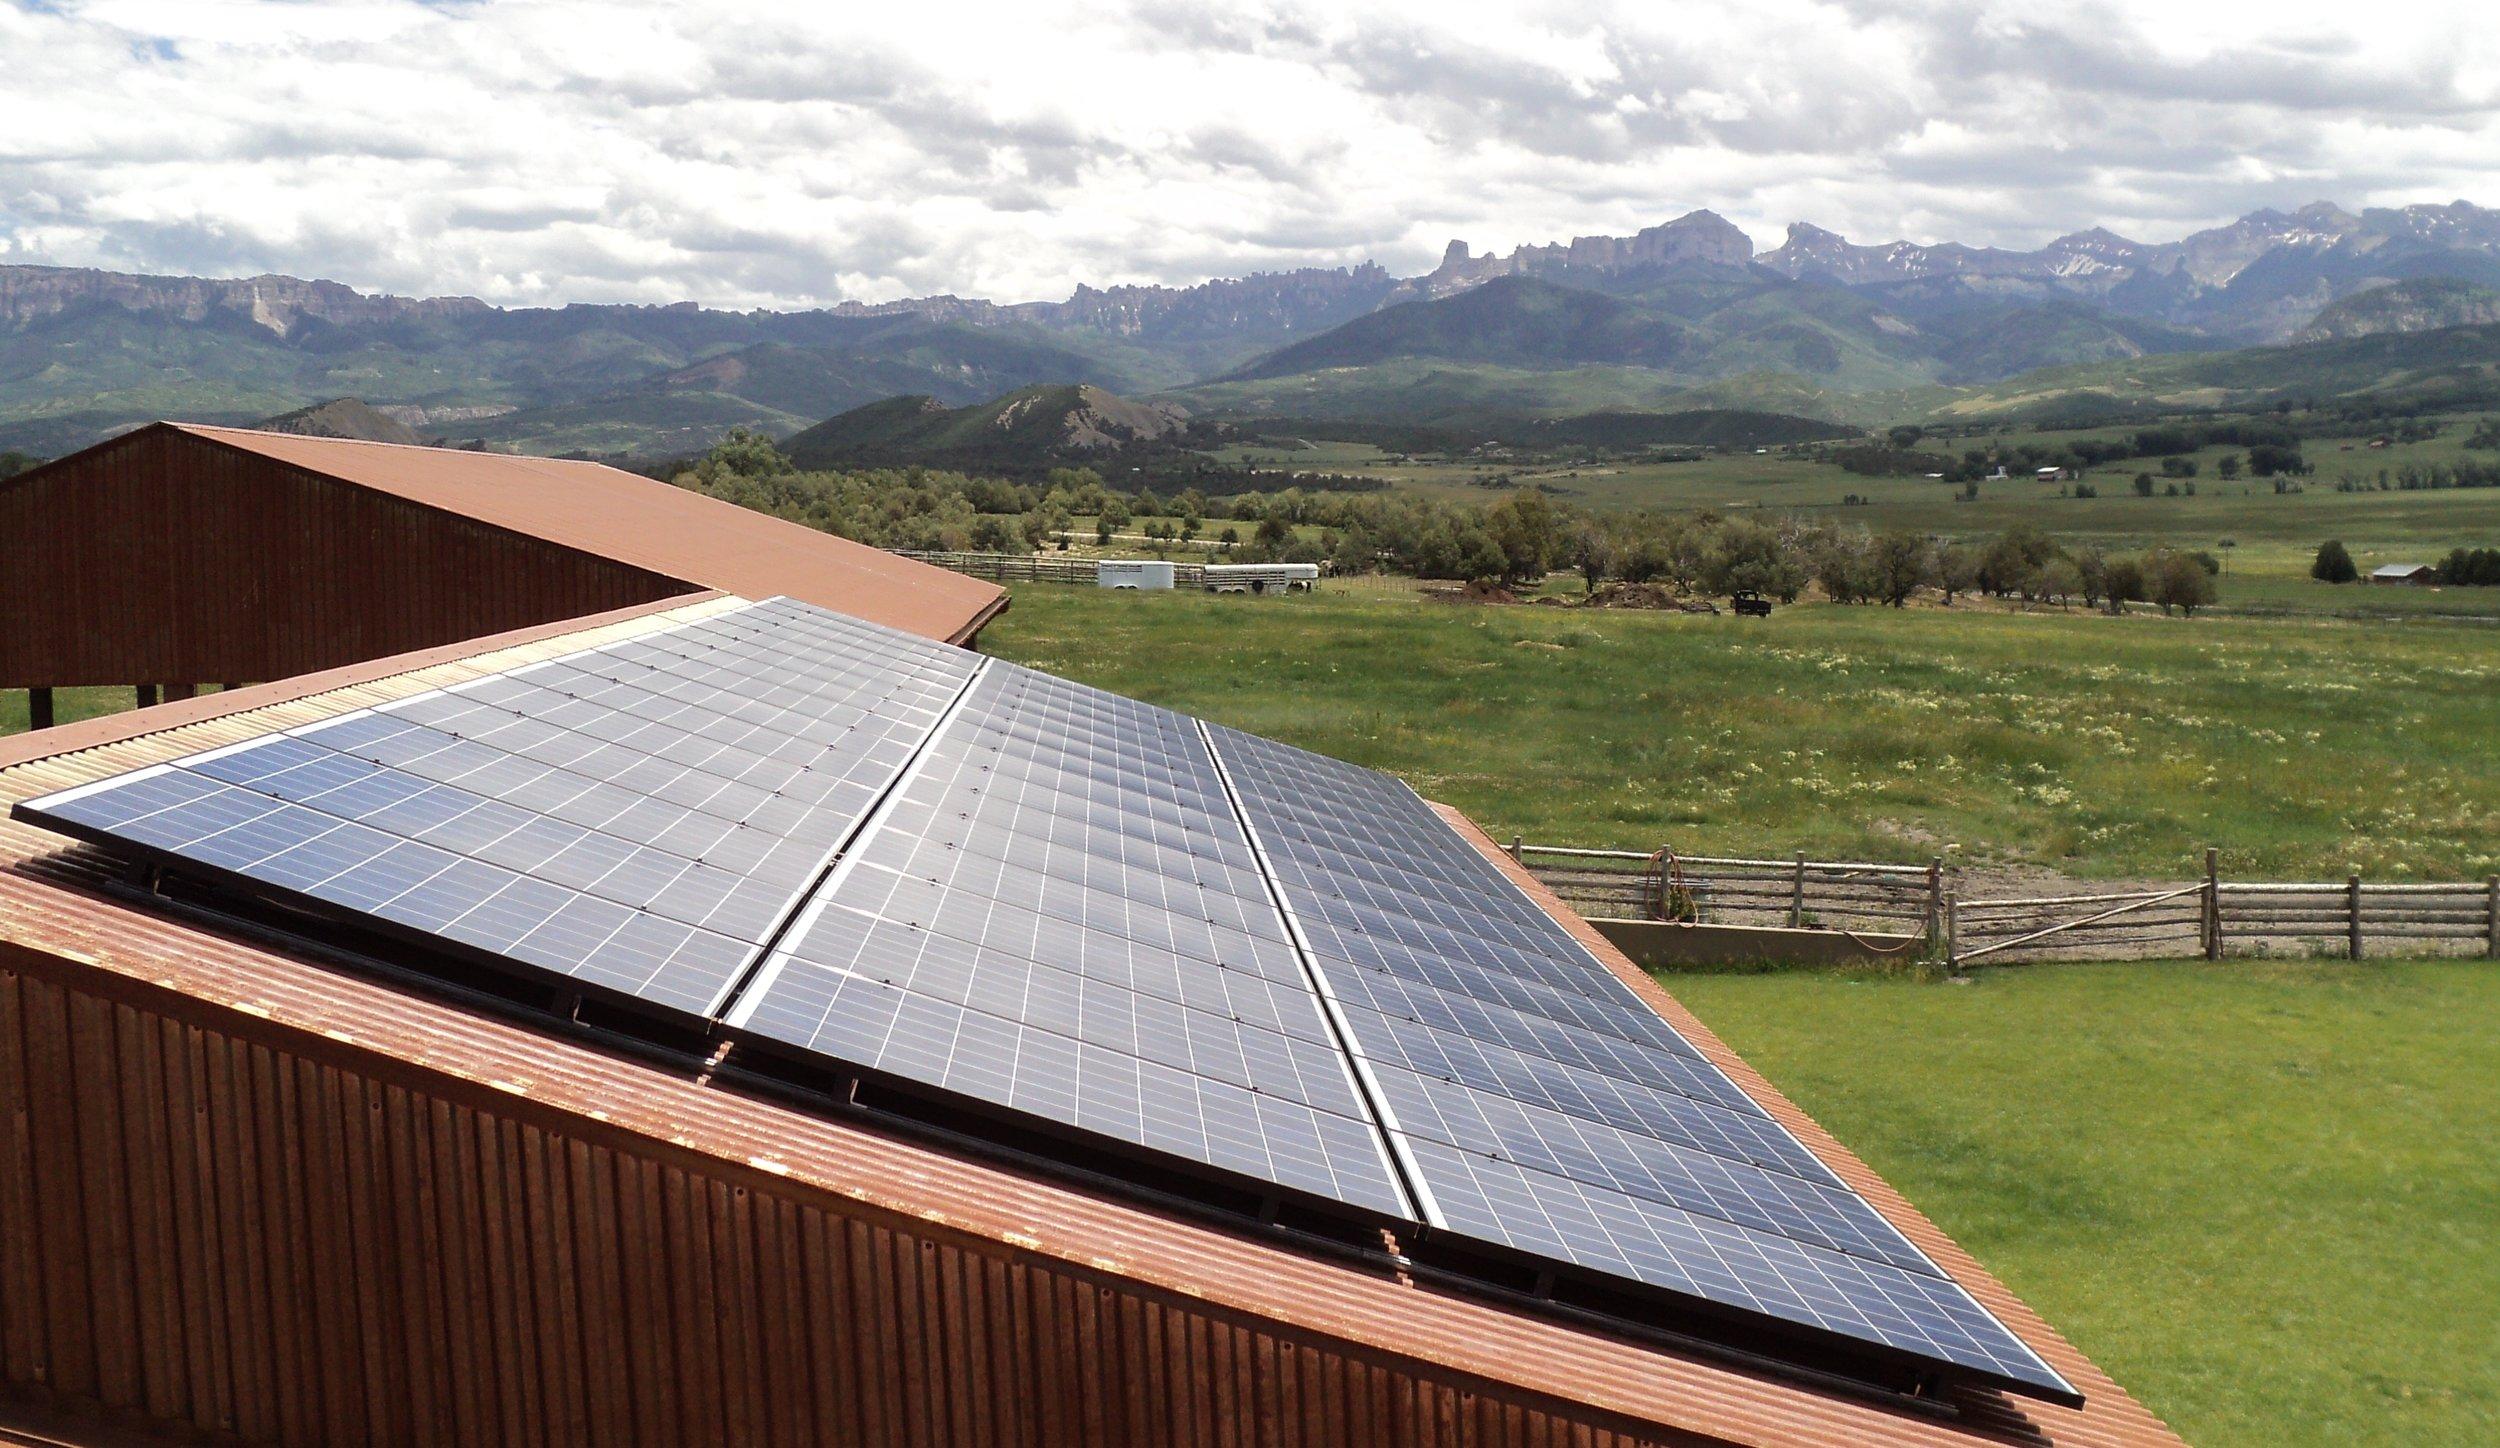 alternative-power-enterprises-solar-installation-projects18.JPG